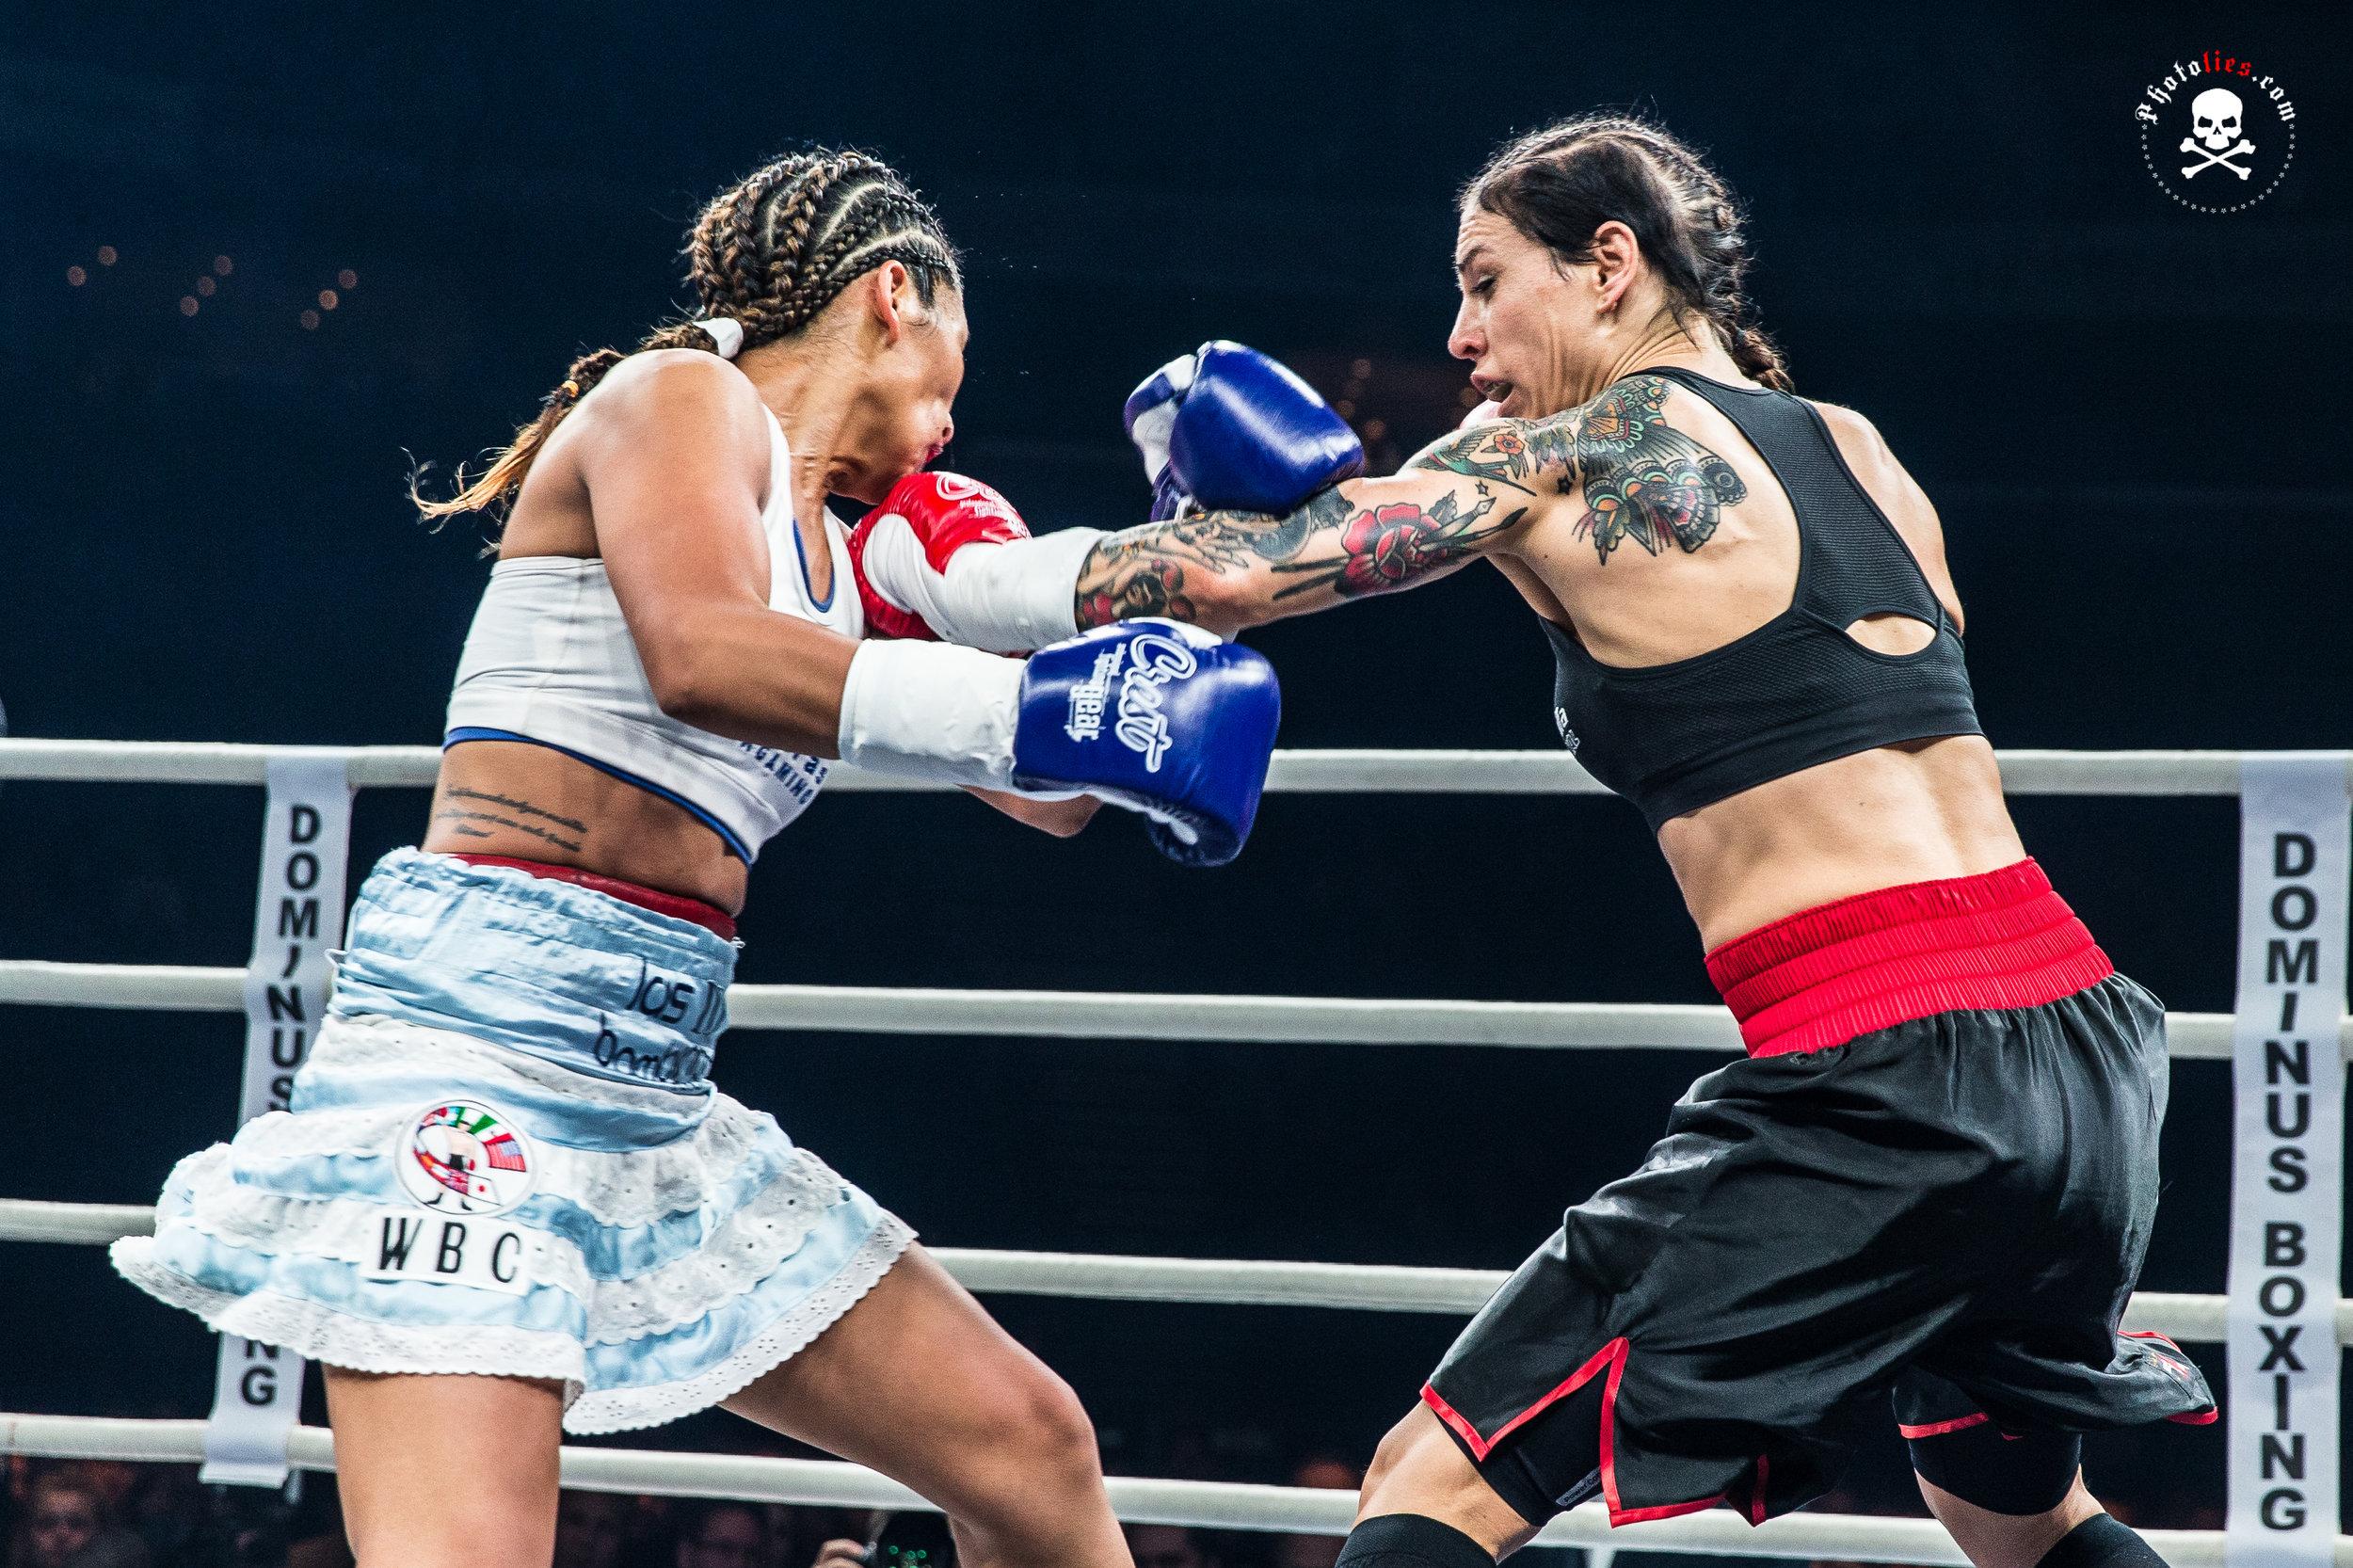 Eva Wahlstrom vs. Anahi Esther Sanchez